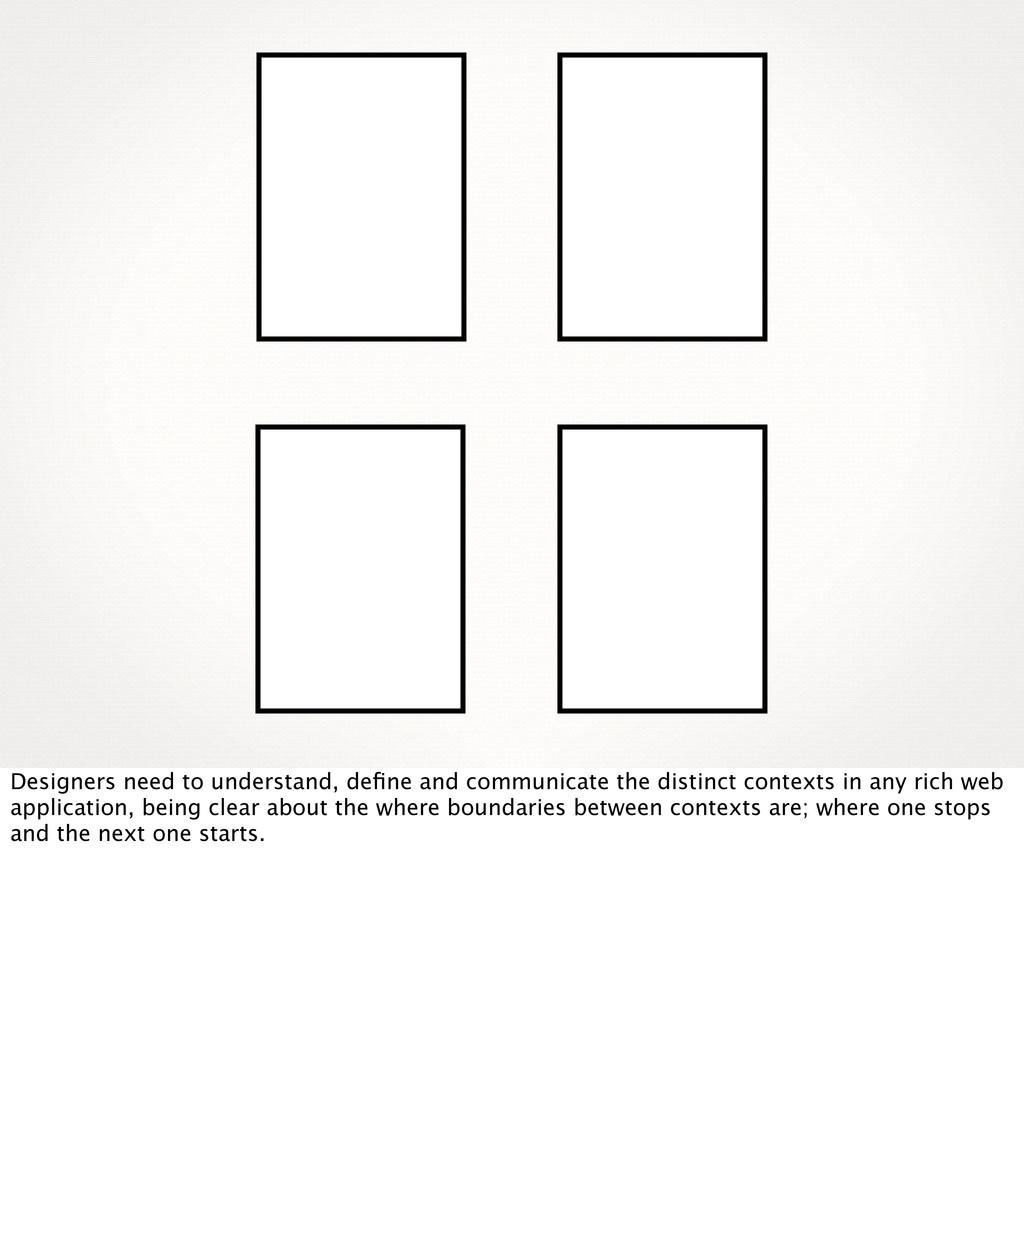 Designers need to understand, define and communi...